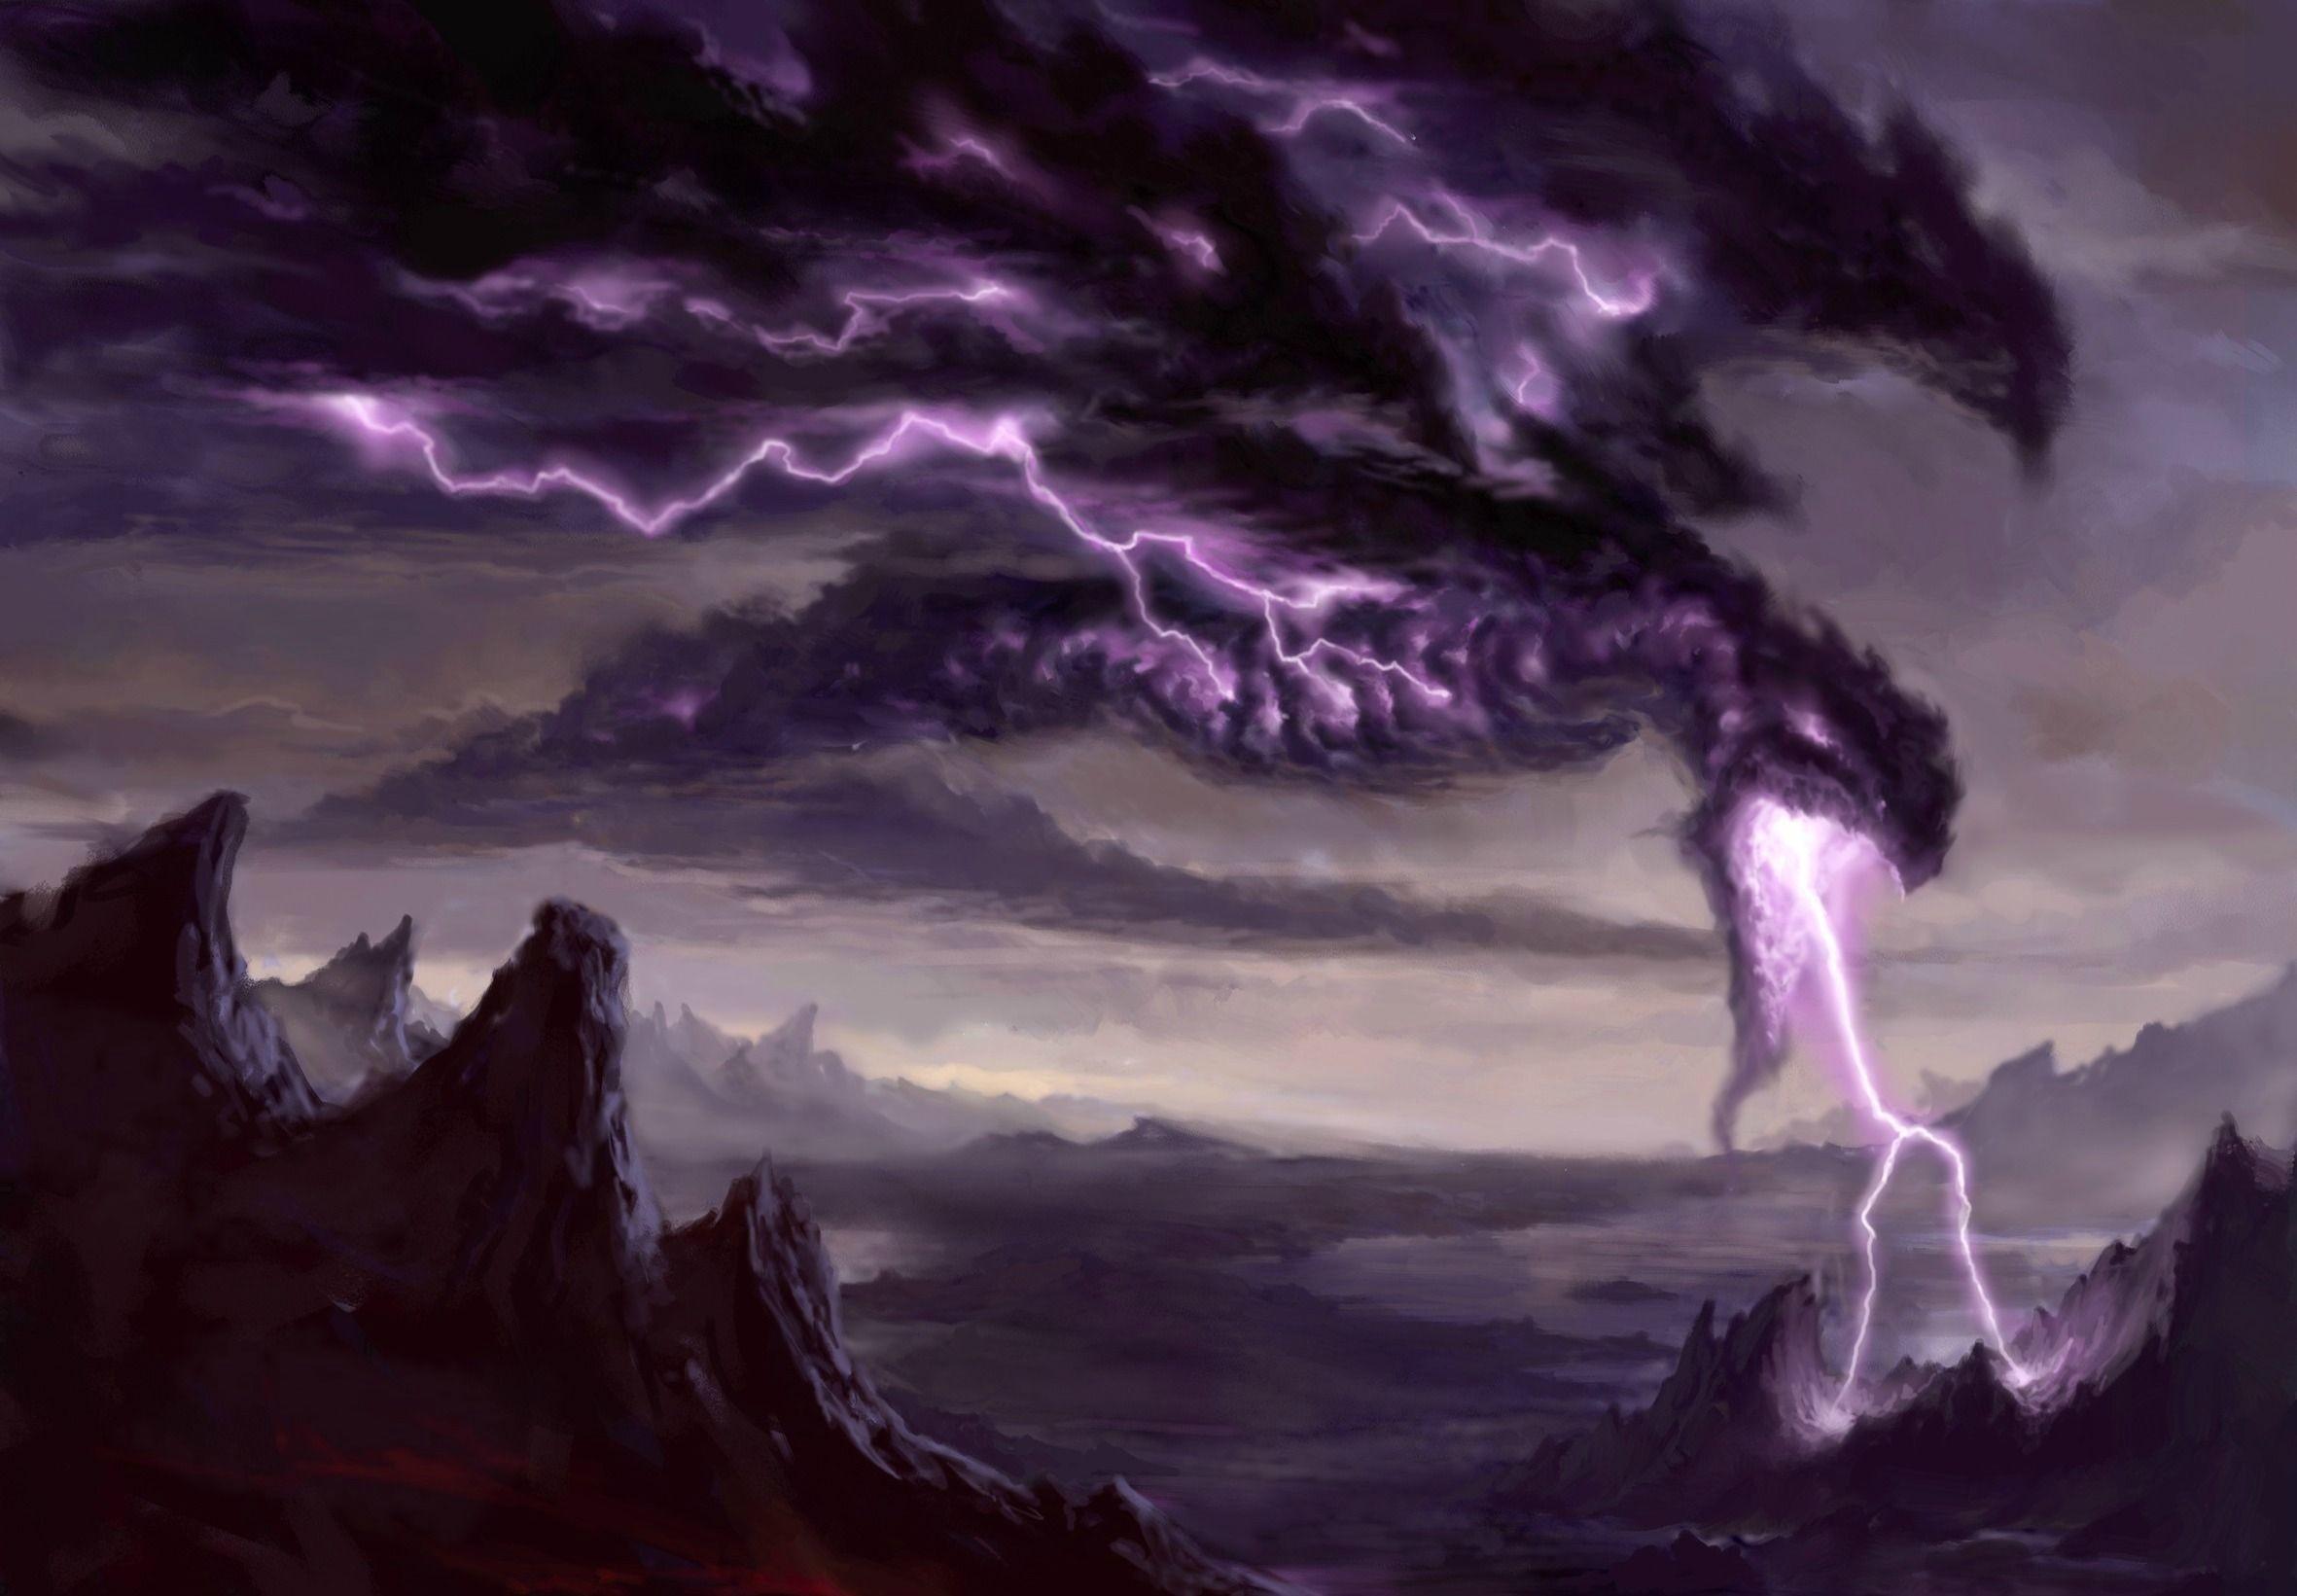 Res: 2362x1641, Black Lightning Dragon Wallpaper